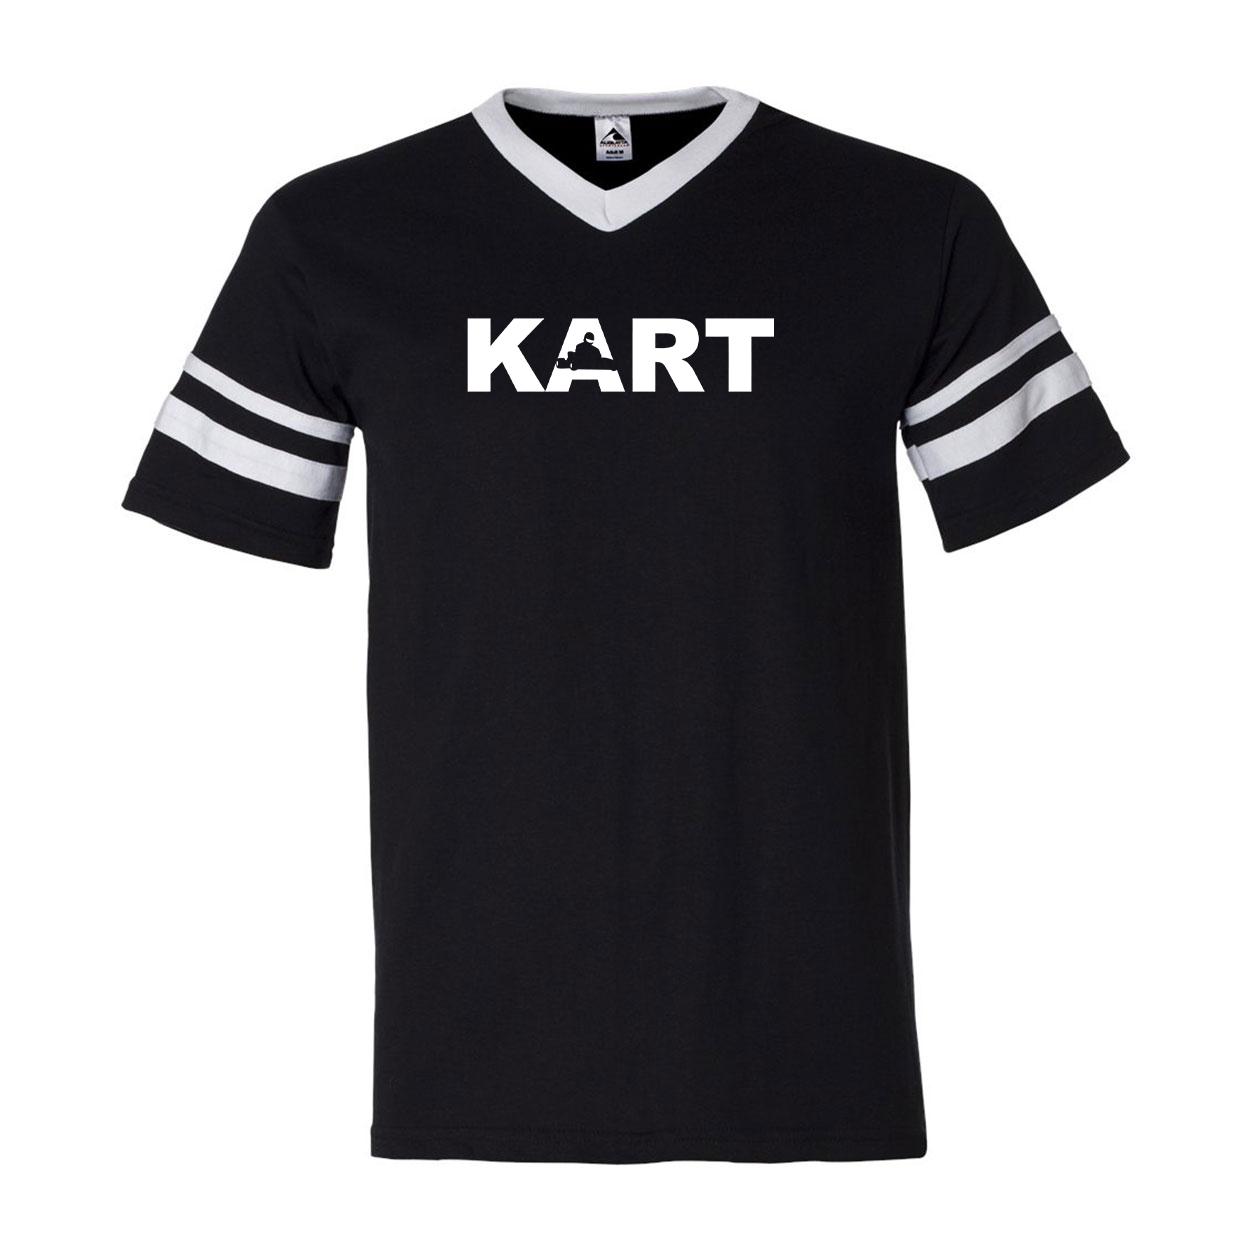 Kart Racer Logo Classic Premium Striped Jersey T-Shirt Black/White (White Logo)